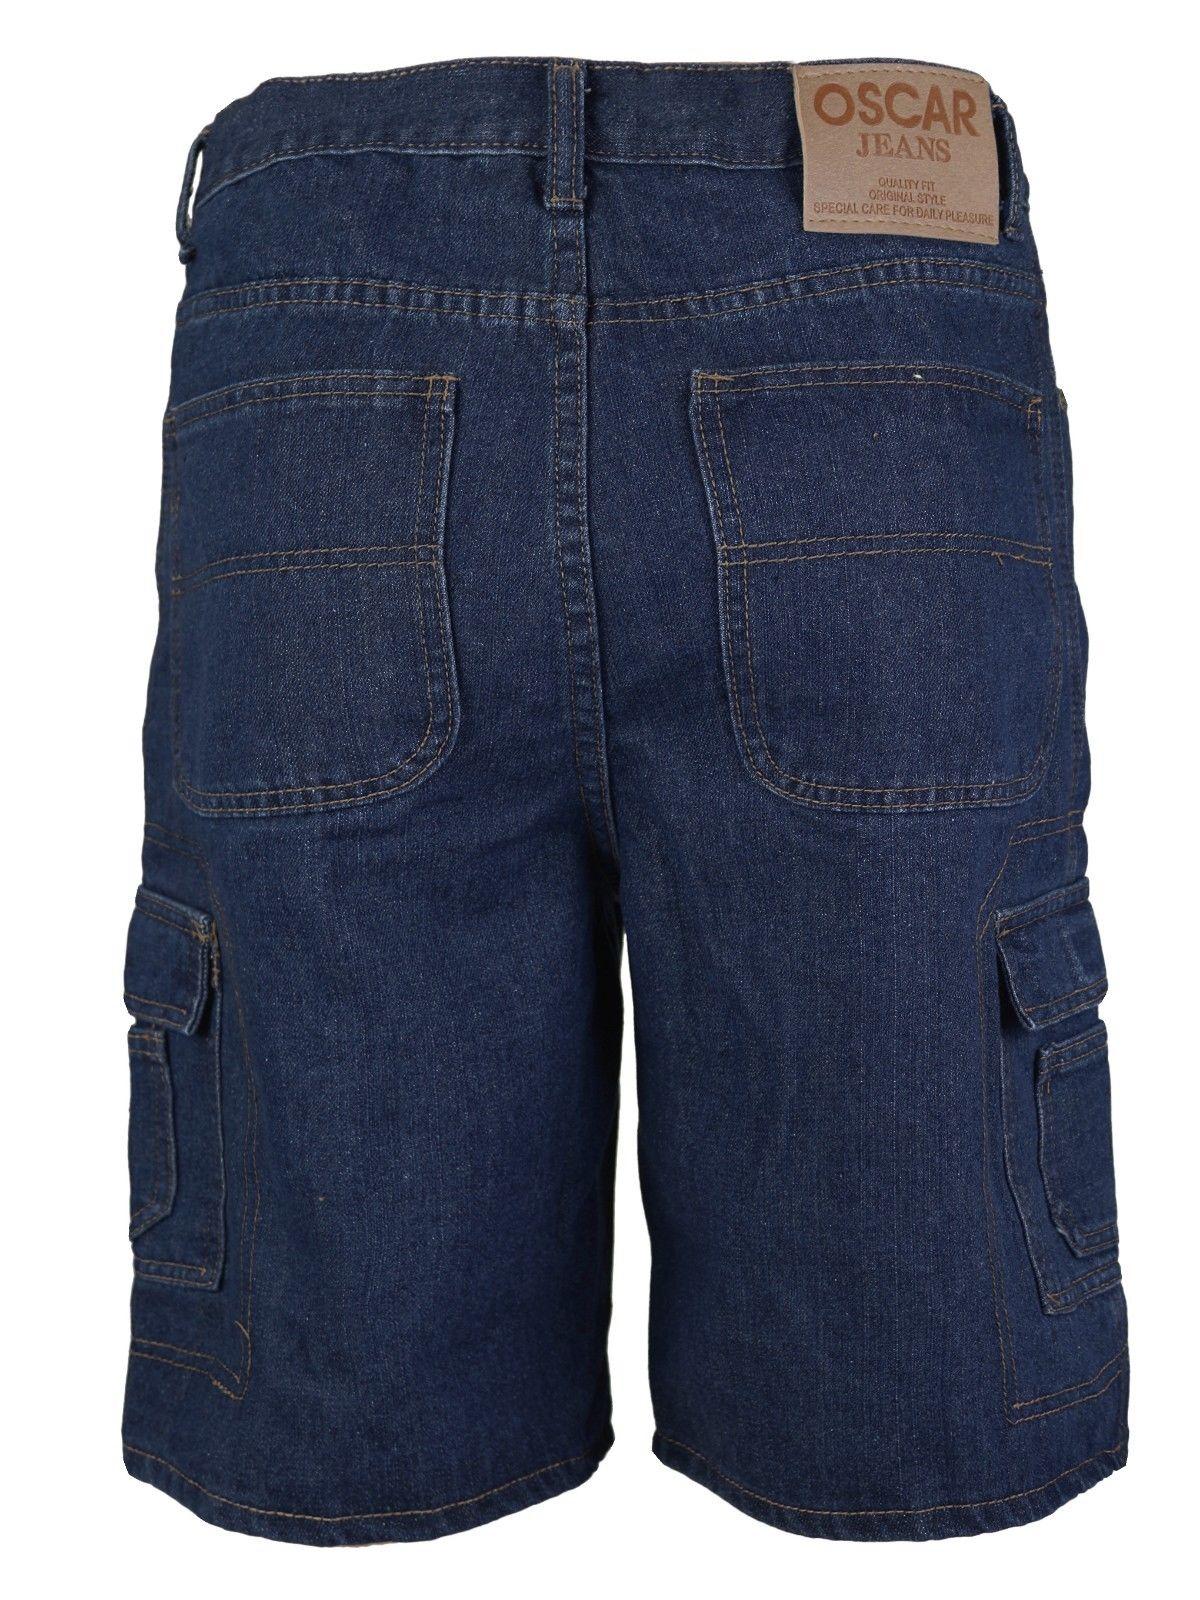 Men-039-s-Premium-Cotton-Multi-Pocket-Relaxed-Fit-Stonewash-Denim-Jean-Cargo-Shorts thumbnail 6